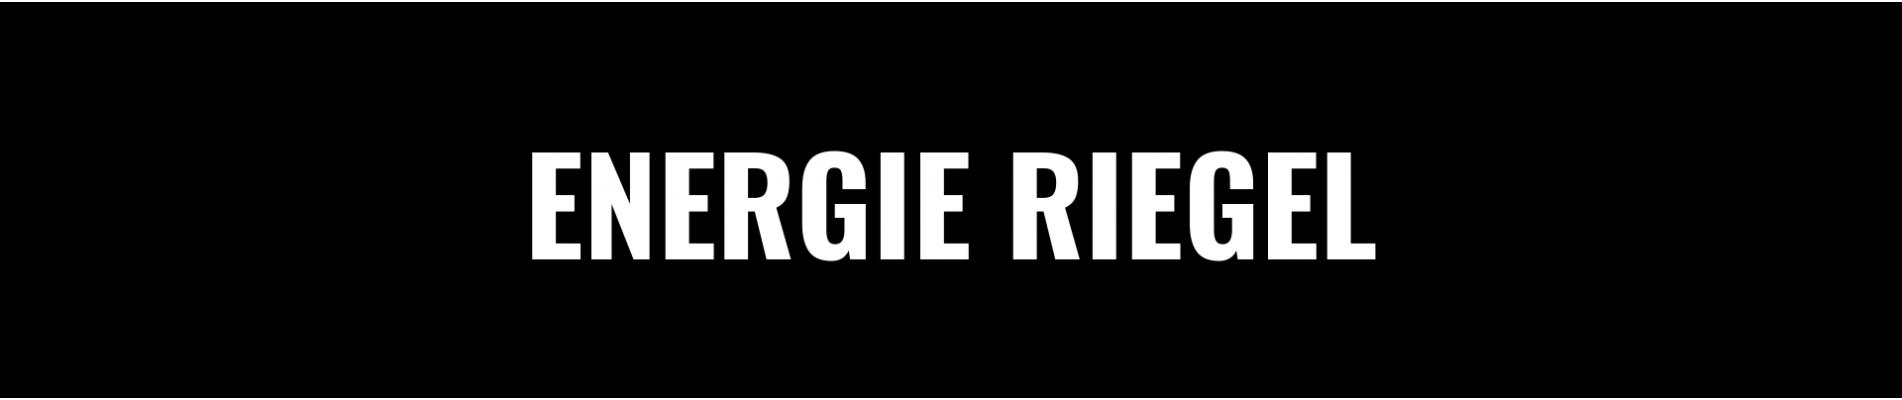 ENERGIE RIEGEL